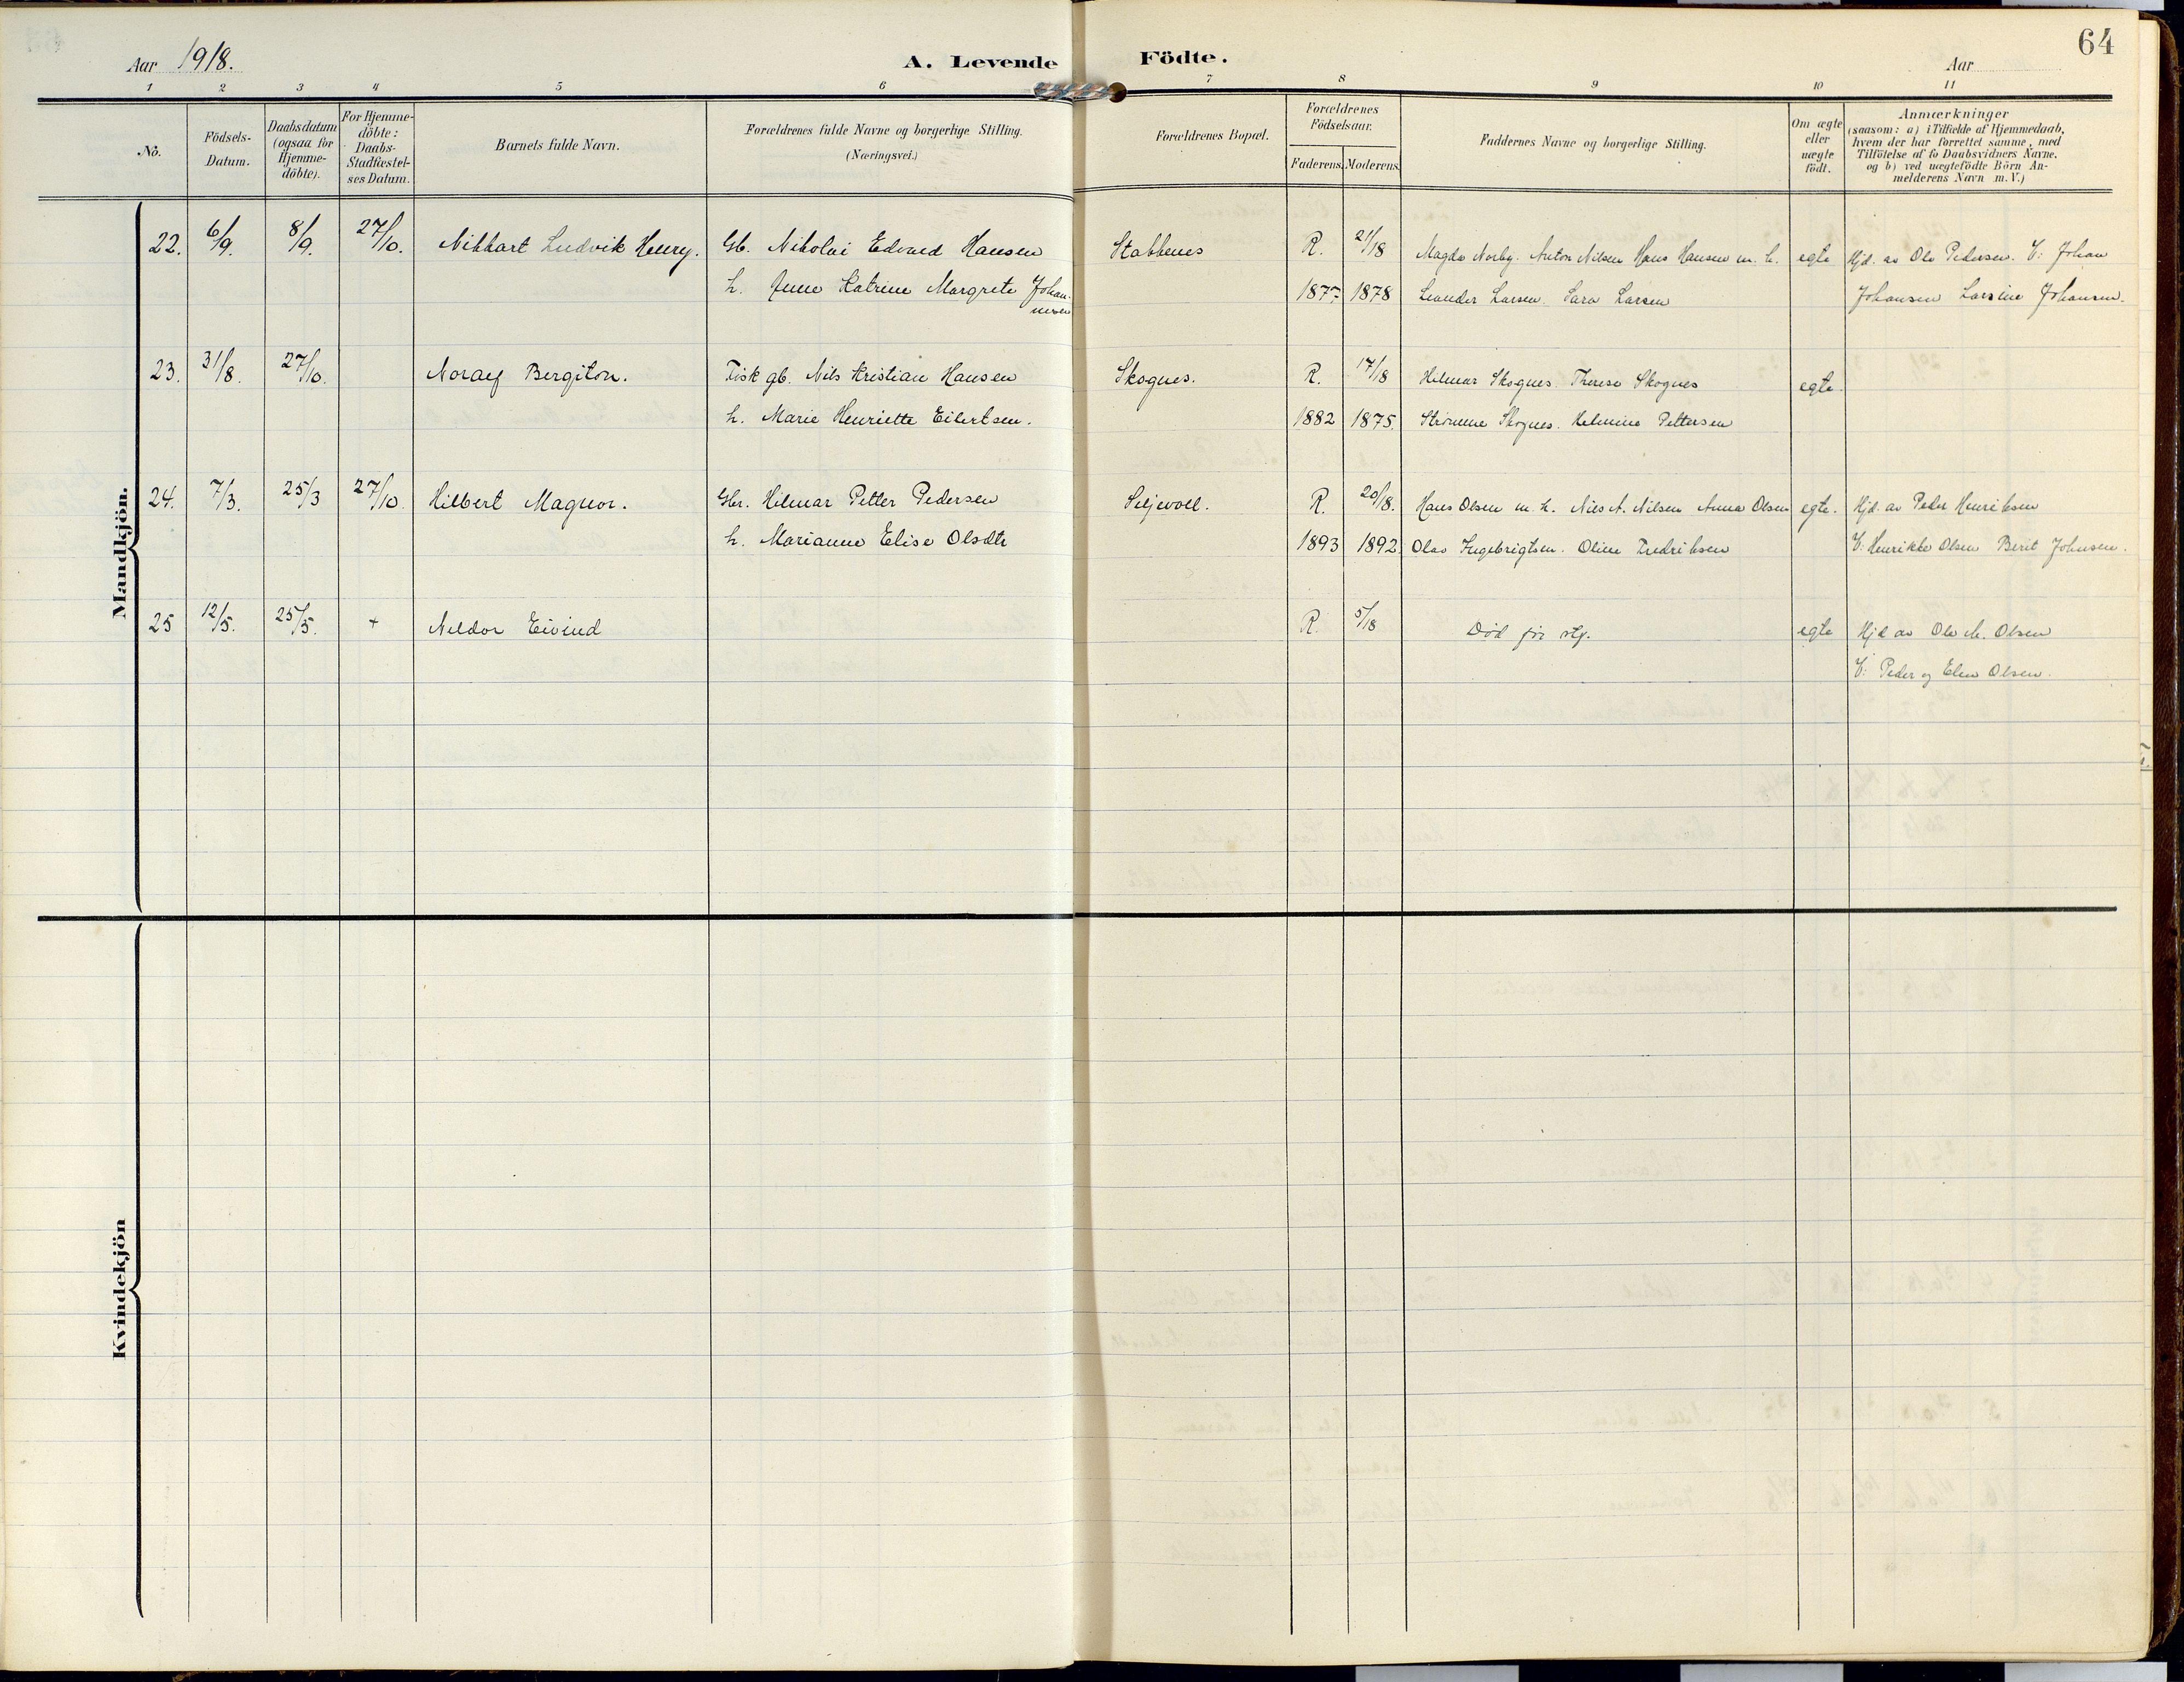 SATØ, Lyngen sokneprestembete, Ministerialbok nr. 14, 1905-1920, s. 64